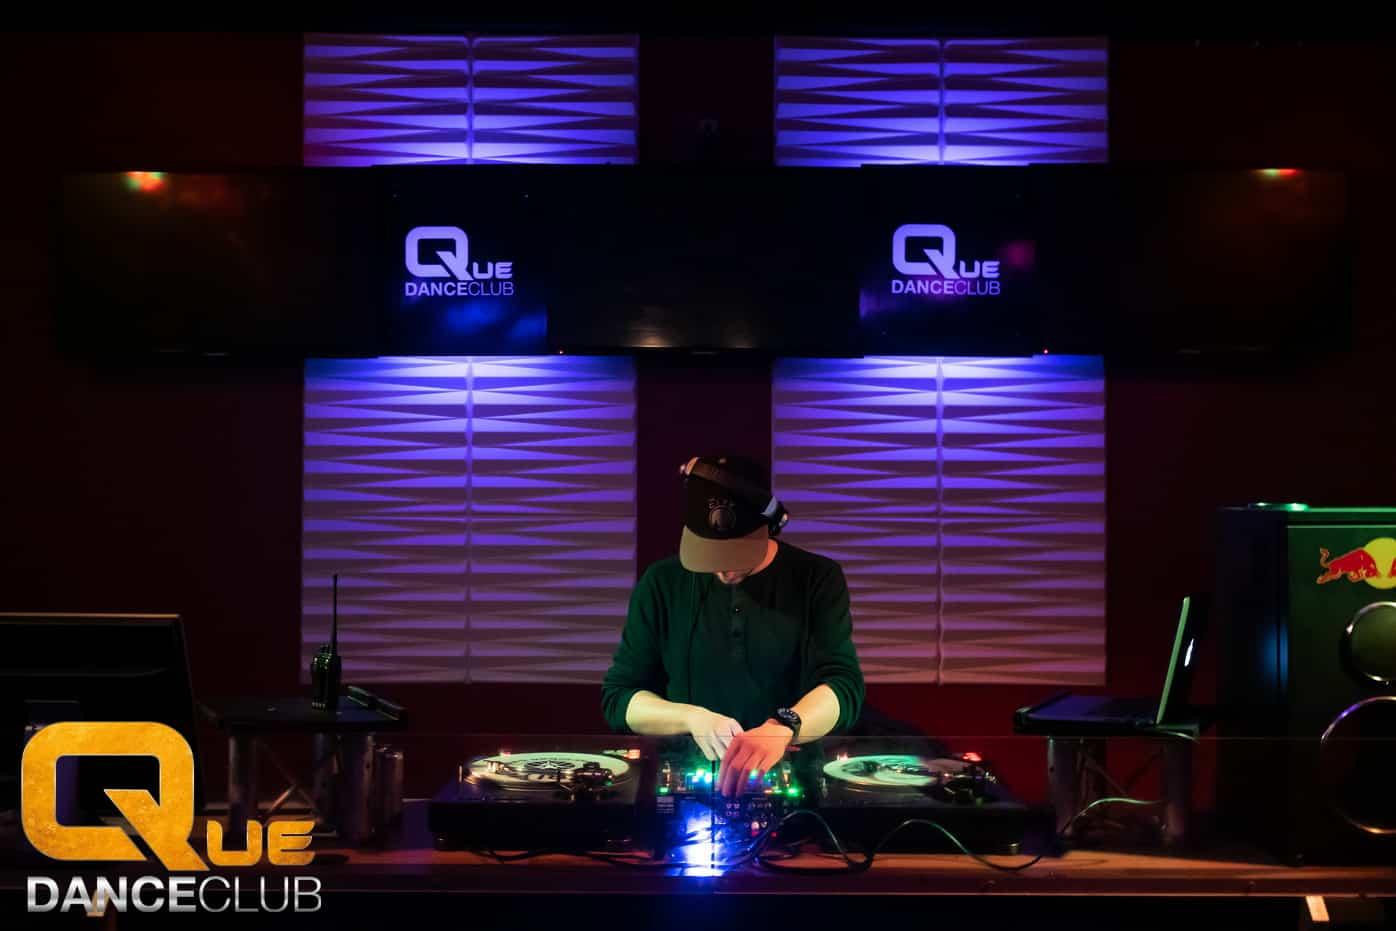 2019_02_15_Que_Danceclub_Secret_Kiss_Nightlife_Scene_Timo_027